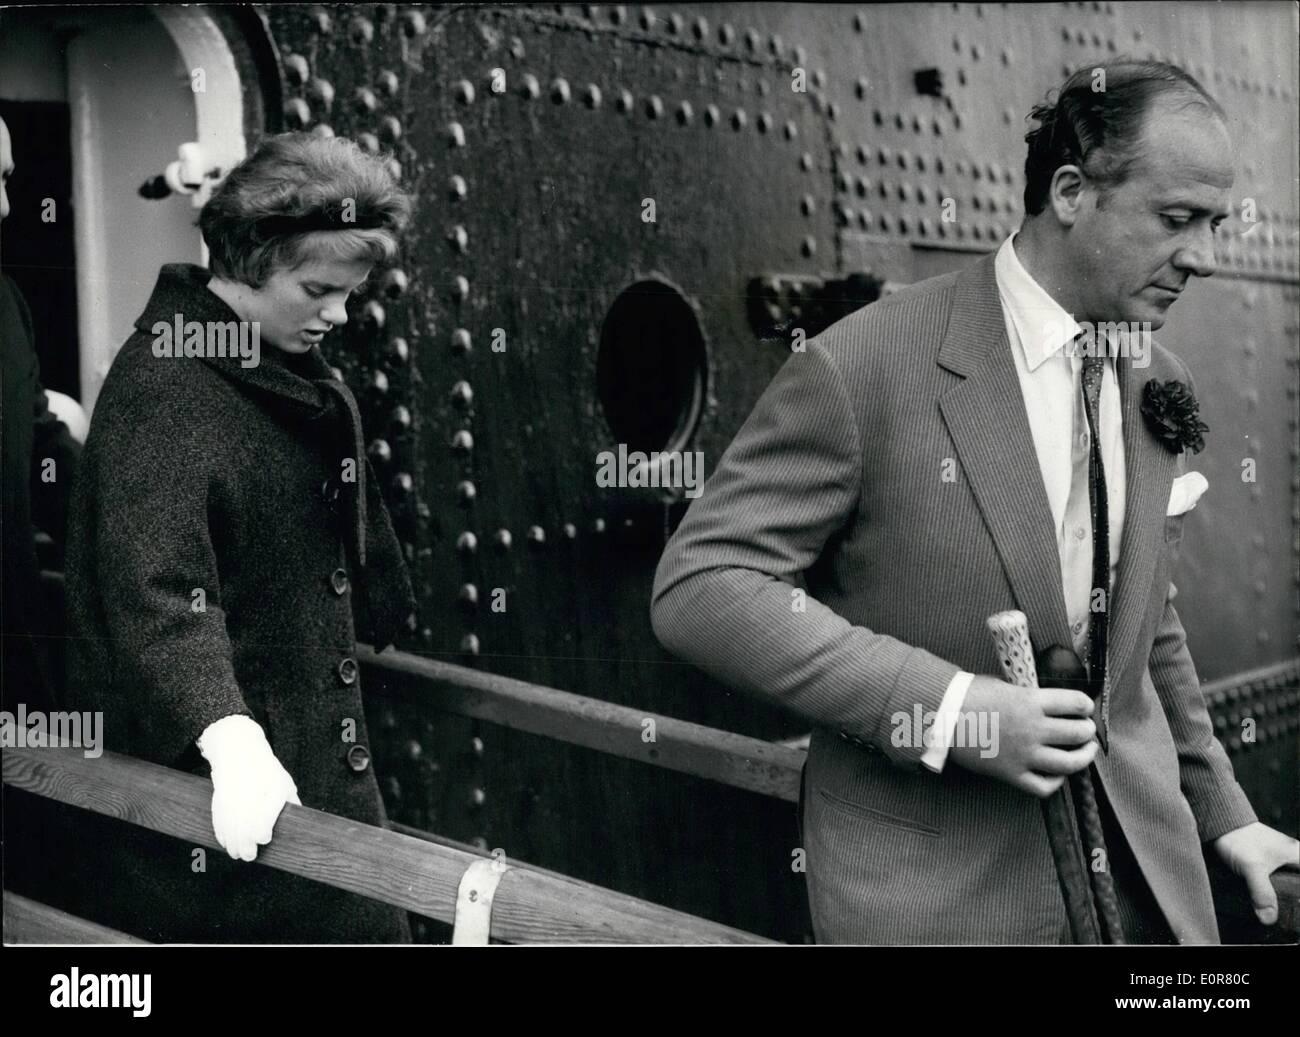 Jul. 15, 1958 - 15.7.58 Dominic Elwes and bride arrive ...